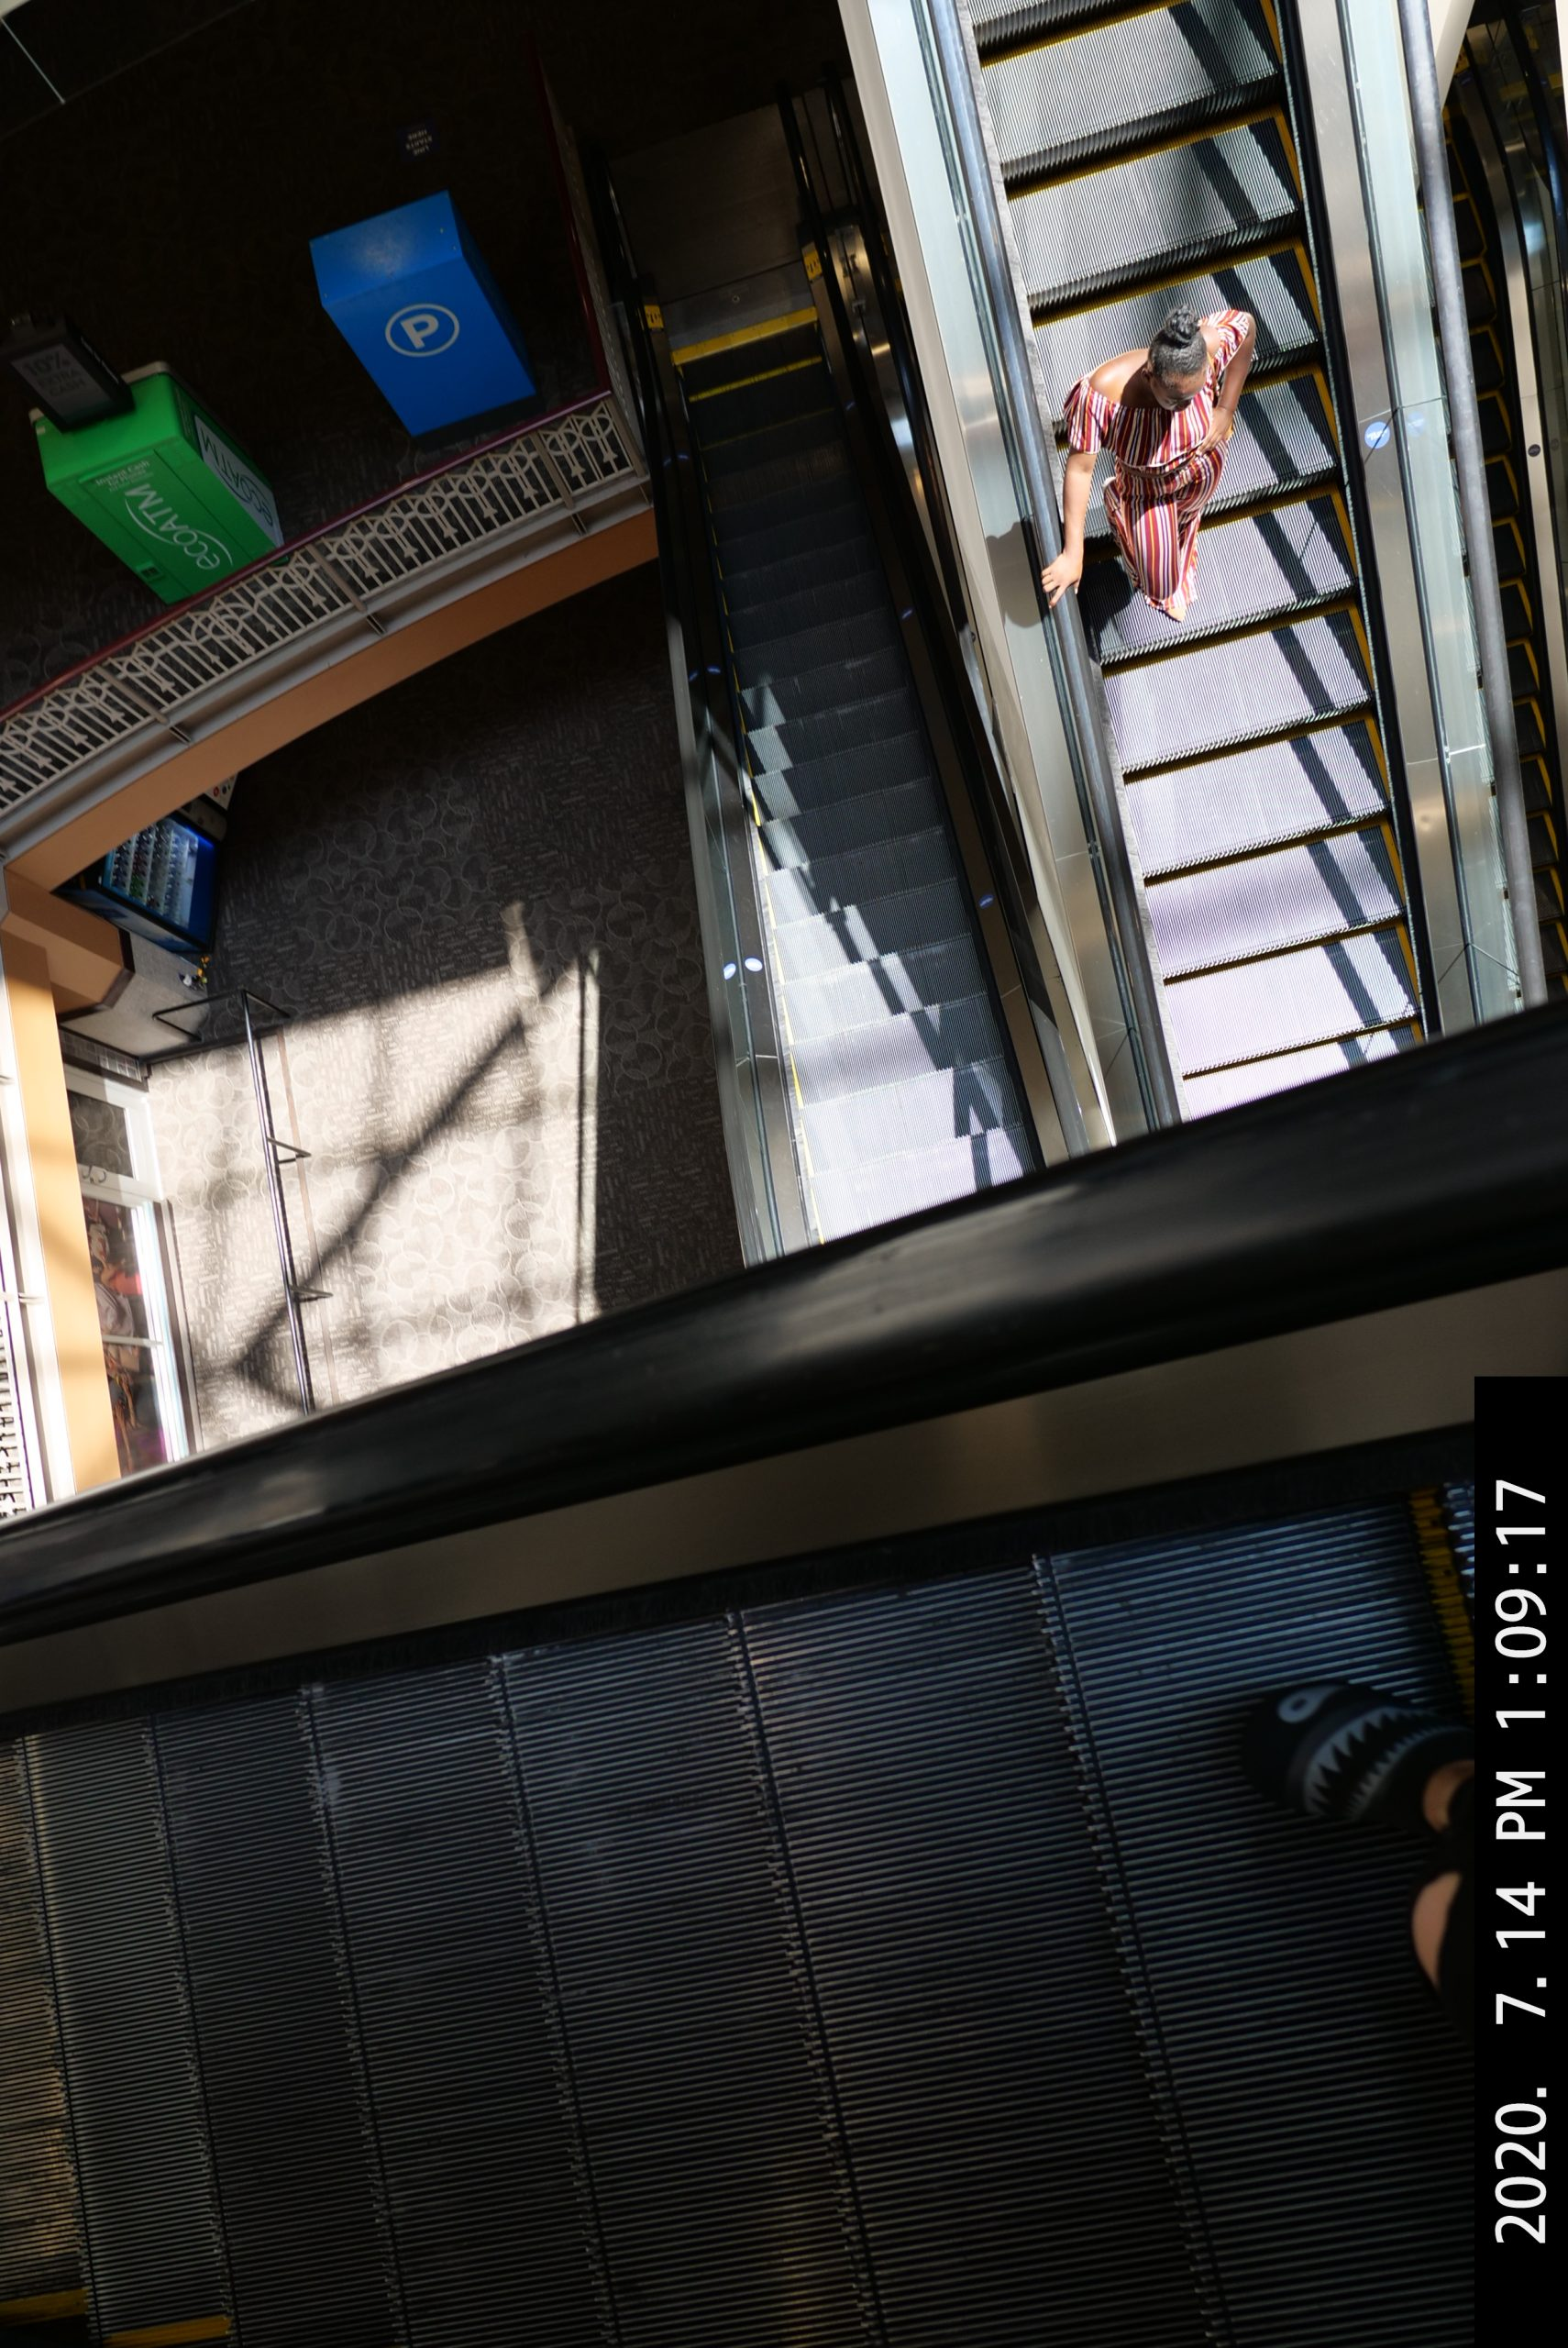 Mall ERIC KIM Street photography Lumix